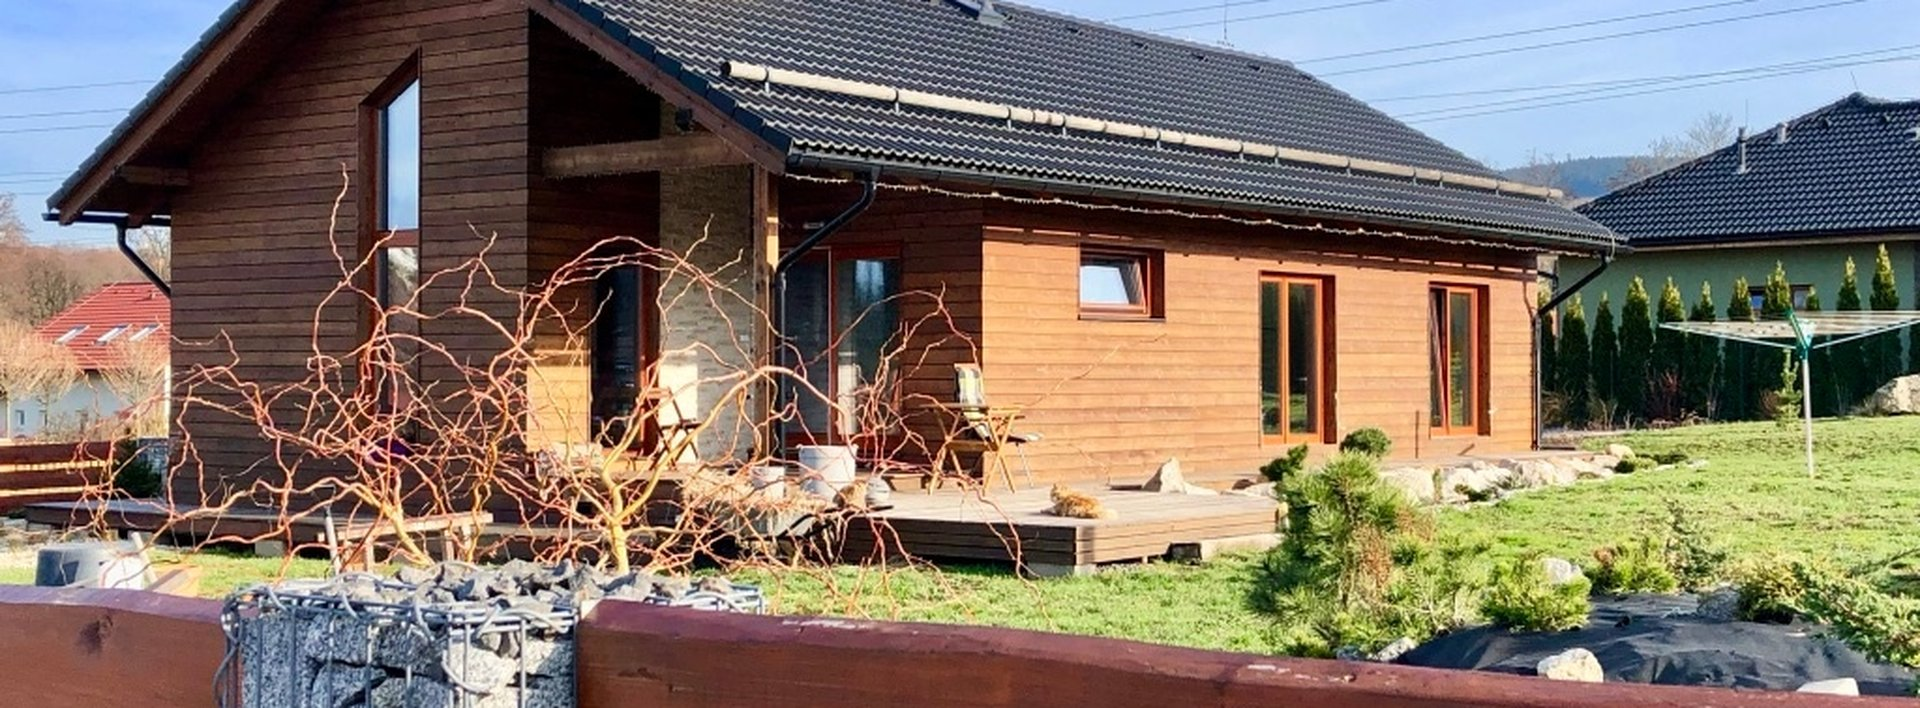 Prodej rodinného domu se zahradou - Liberec - Šimonovice, Ev.č.: N48709